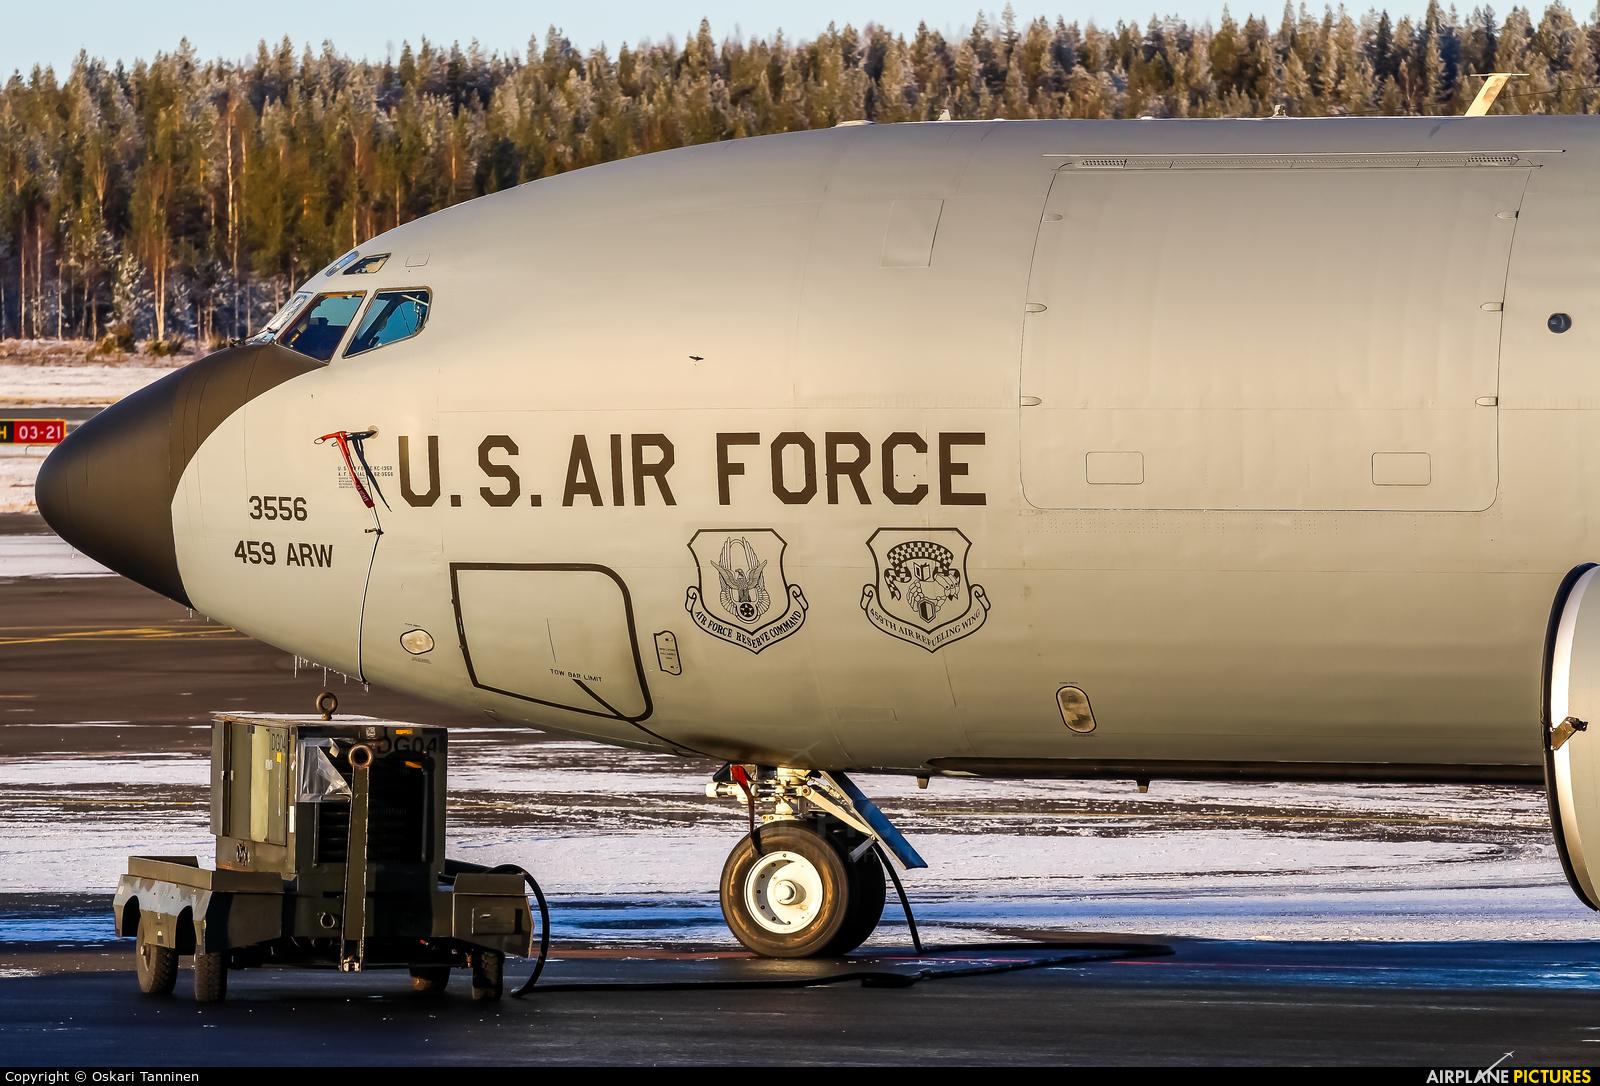 USA - Air Force AFRC 62-3556 aircraft at Rovaniemi